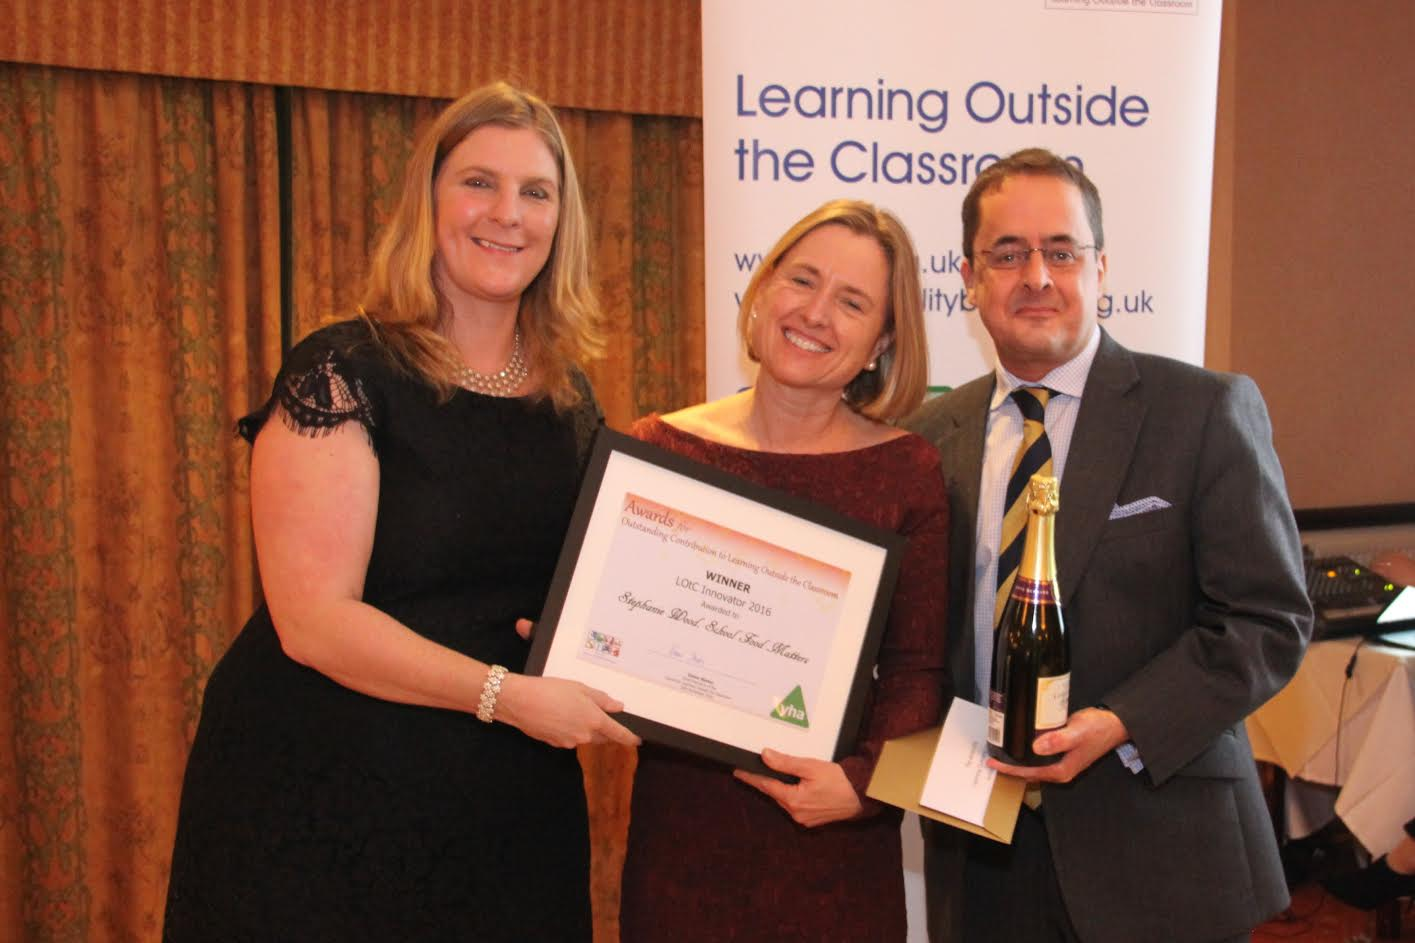 Elaine Skates, Stephanie Wood, Joe Lynch: Miss Wood is founder of School Food Matters